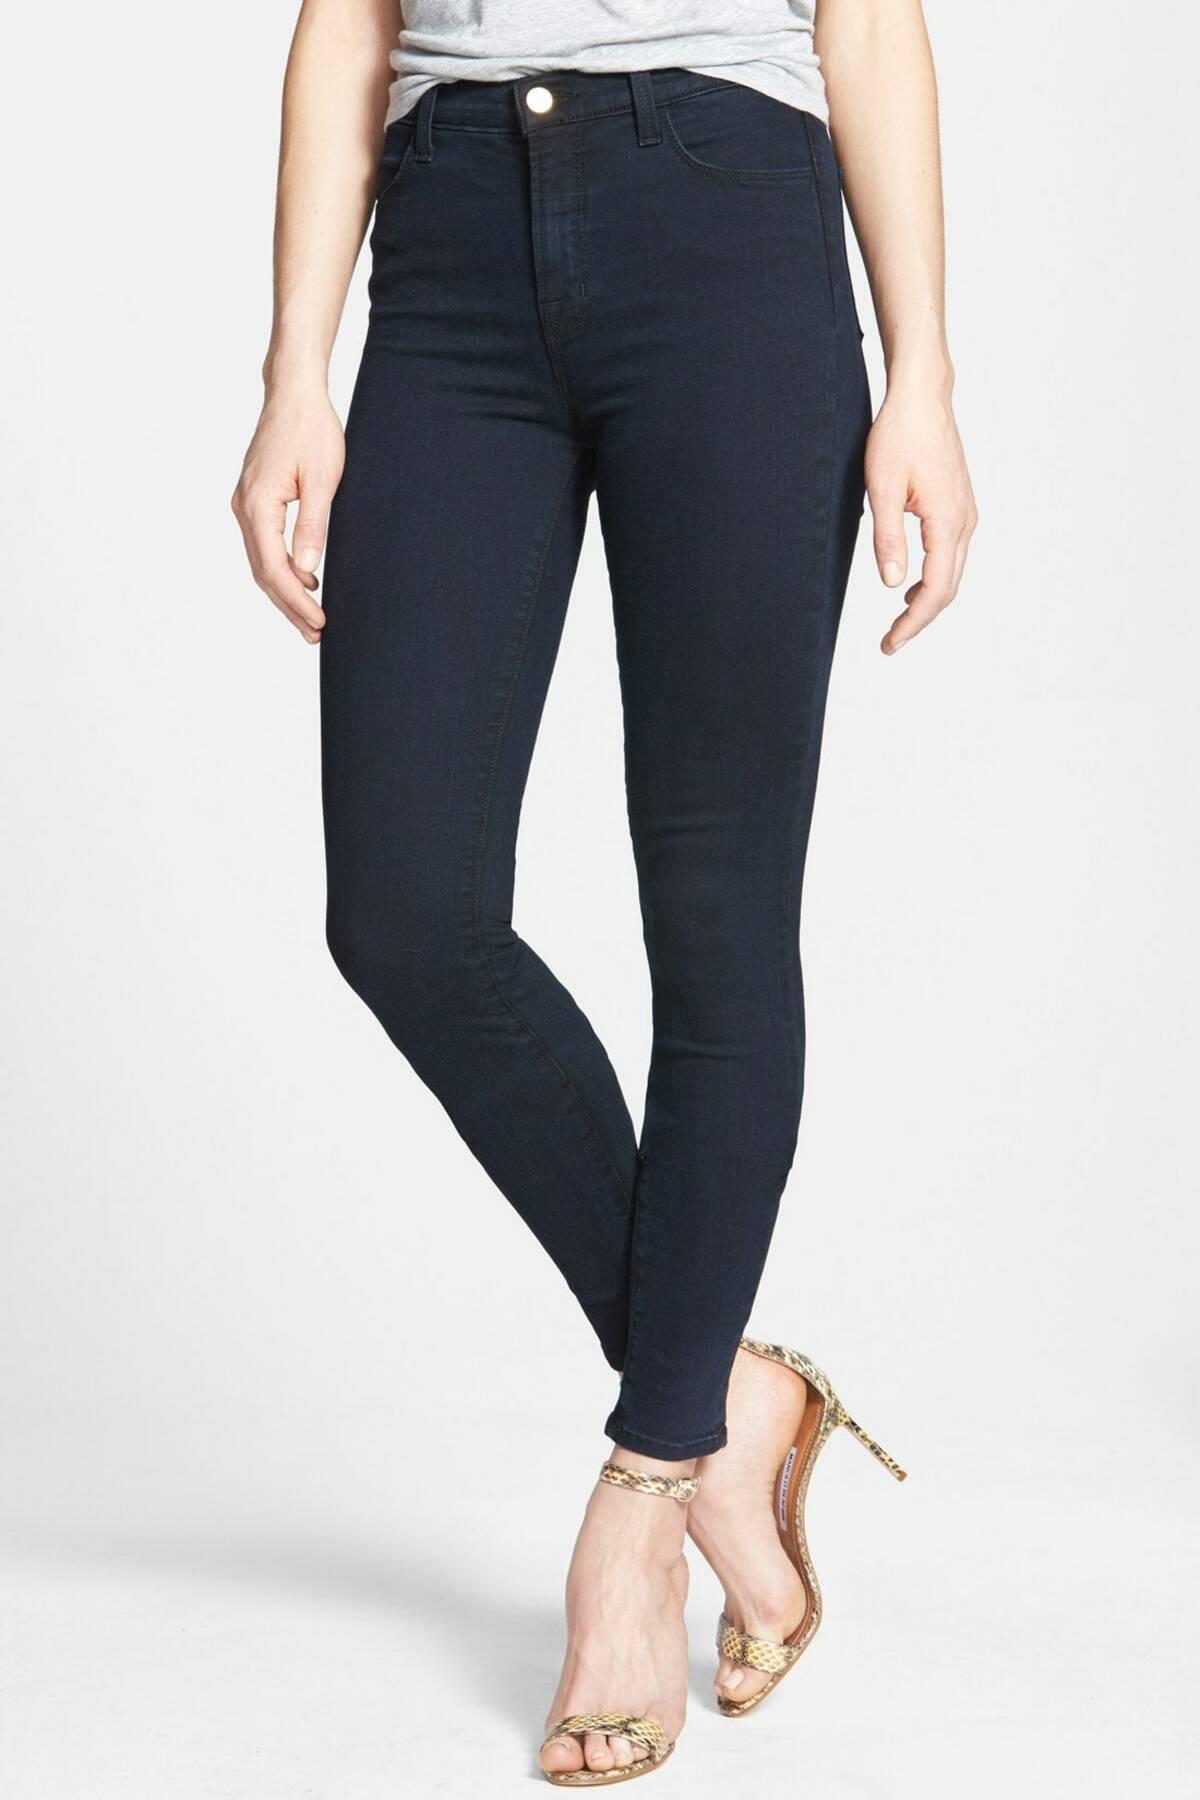 ea46ca7eb5f7 J Brand. Women's 2311 Maria High Waist Super Skinny Jeans (photo Ready Blue  Bird)